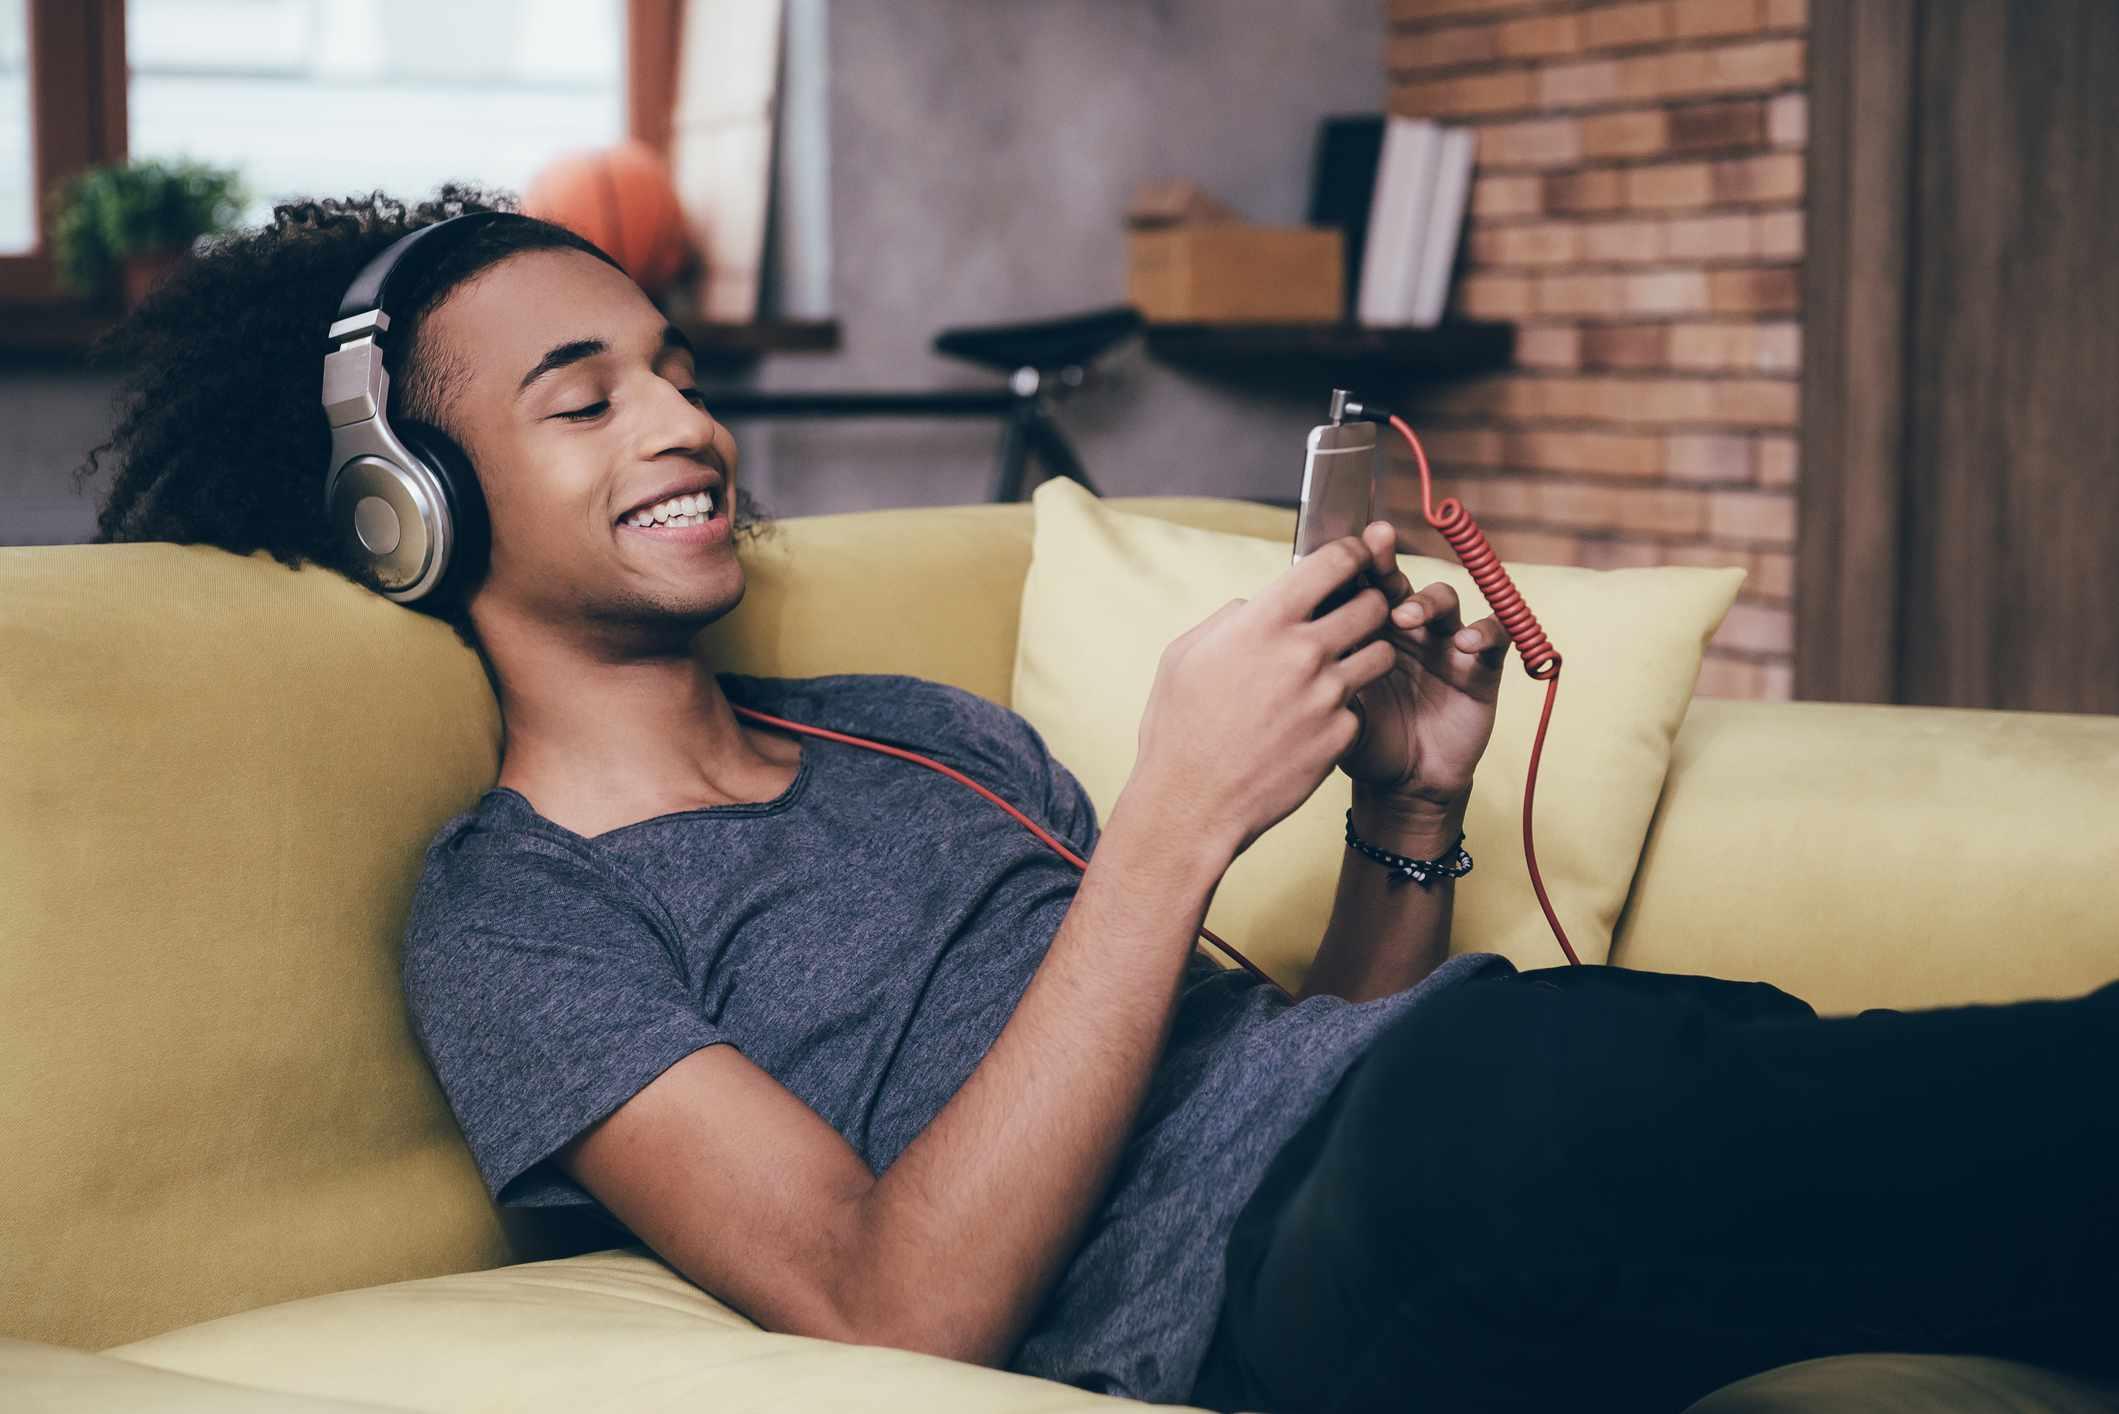 Teen boy listening to music